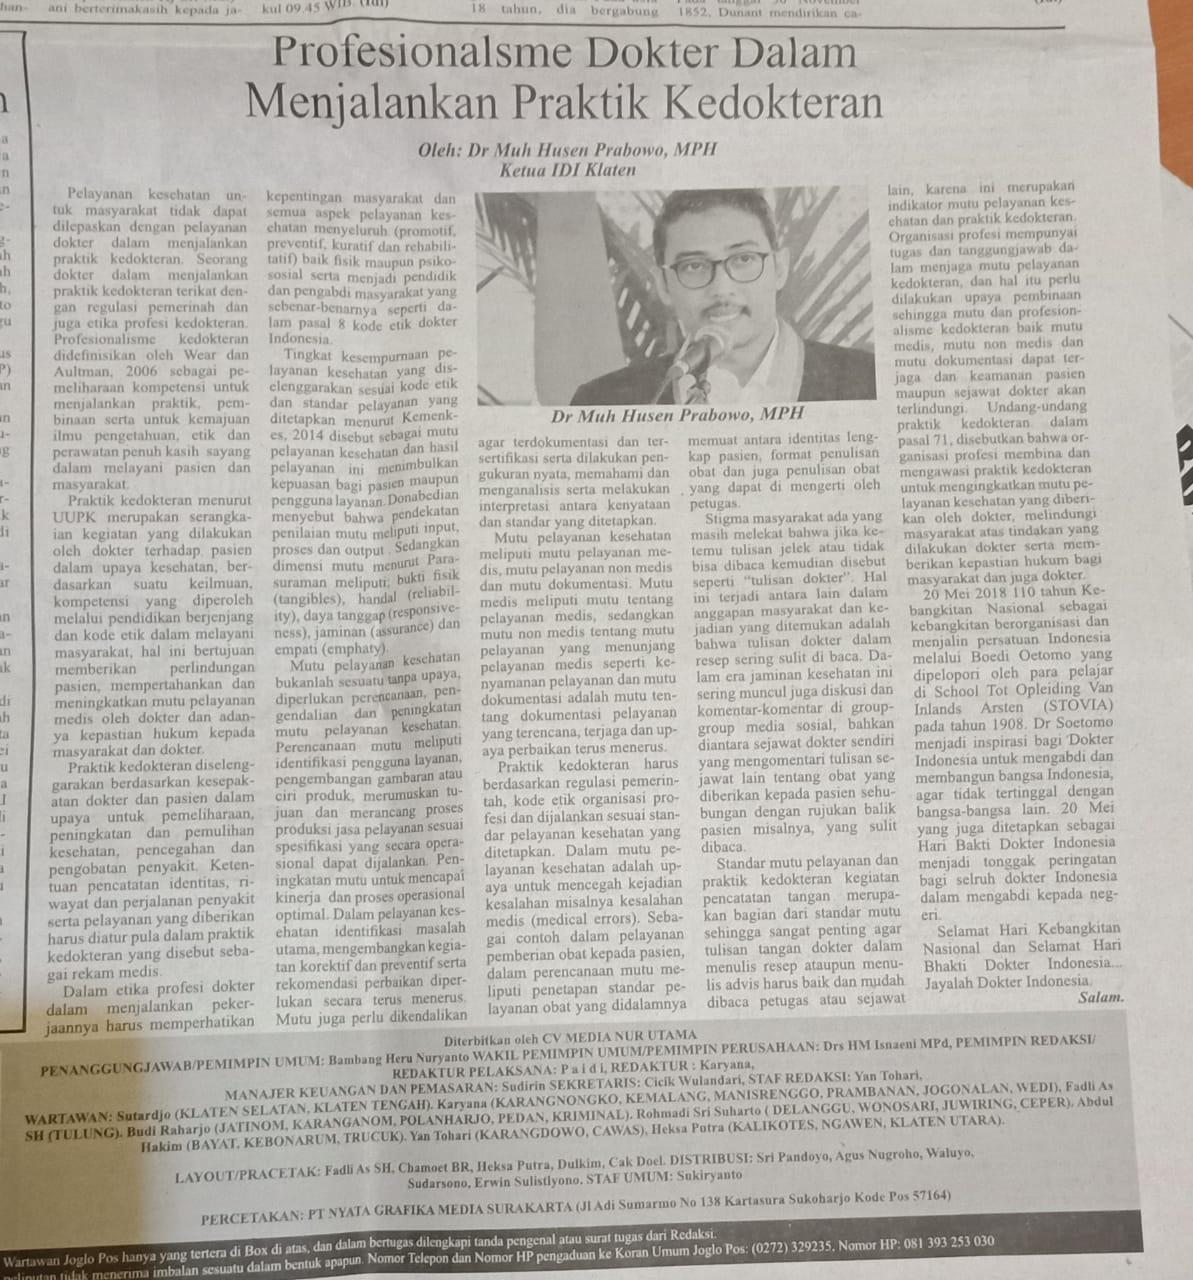 Opini mahasiswa IKM a.n Muh Husen Prabowo